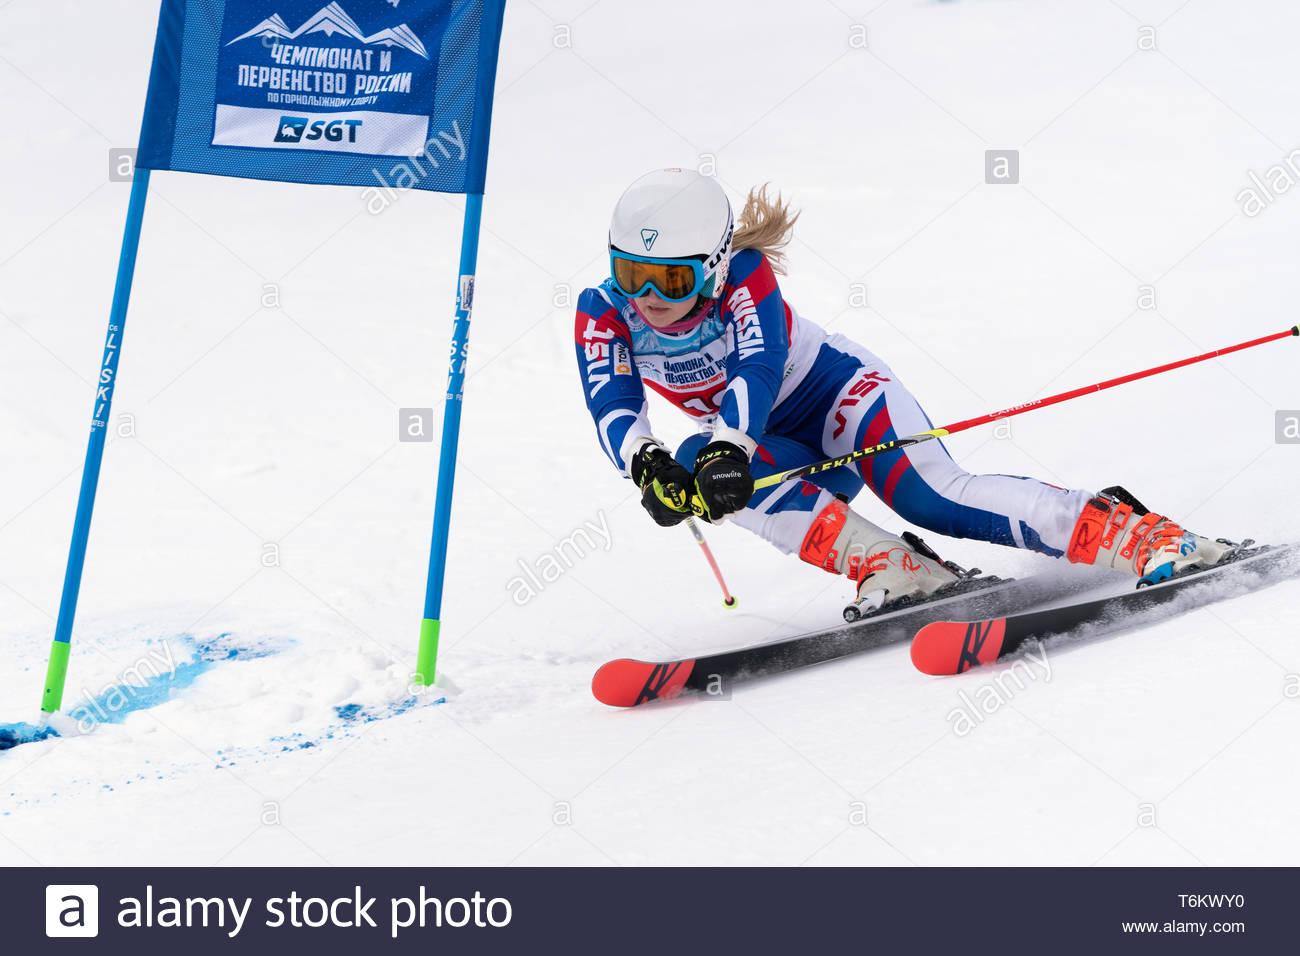 KAMCHATKA PENINSULA, RUSSIA - APRIL 2, 2019: Mountain skier Yaroslava Popova (Krasnoyarsk) skiing down mount. International Ski Federation, Championsh - Stock Image